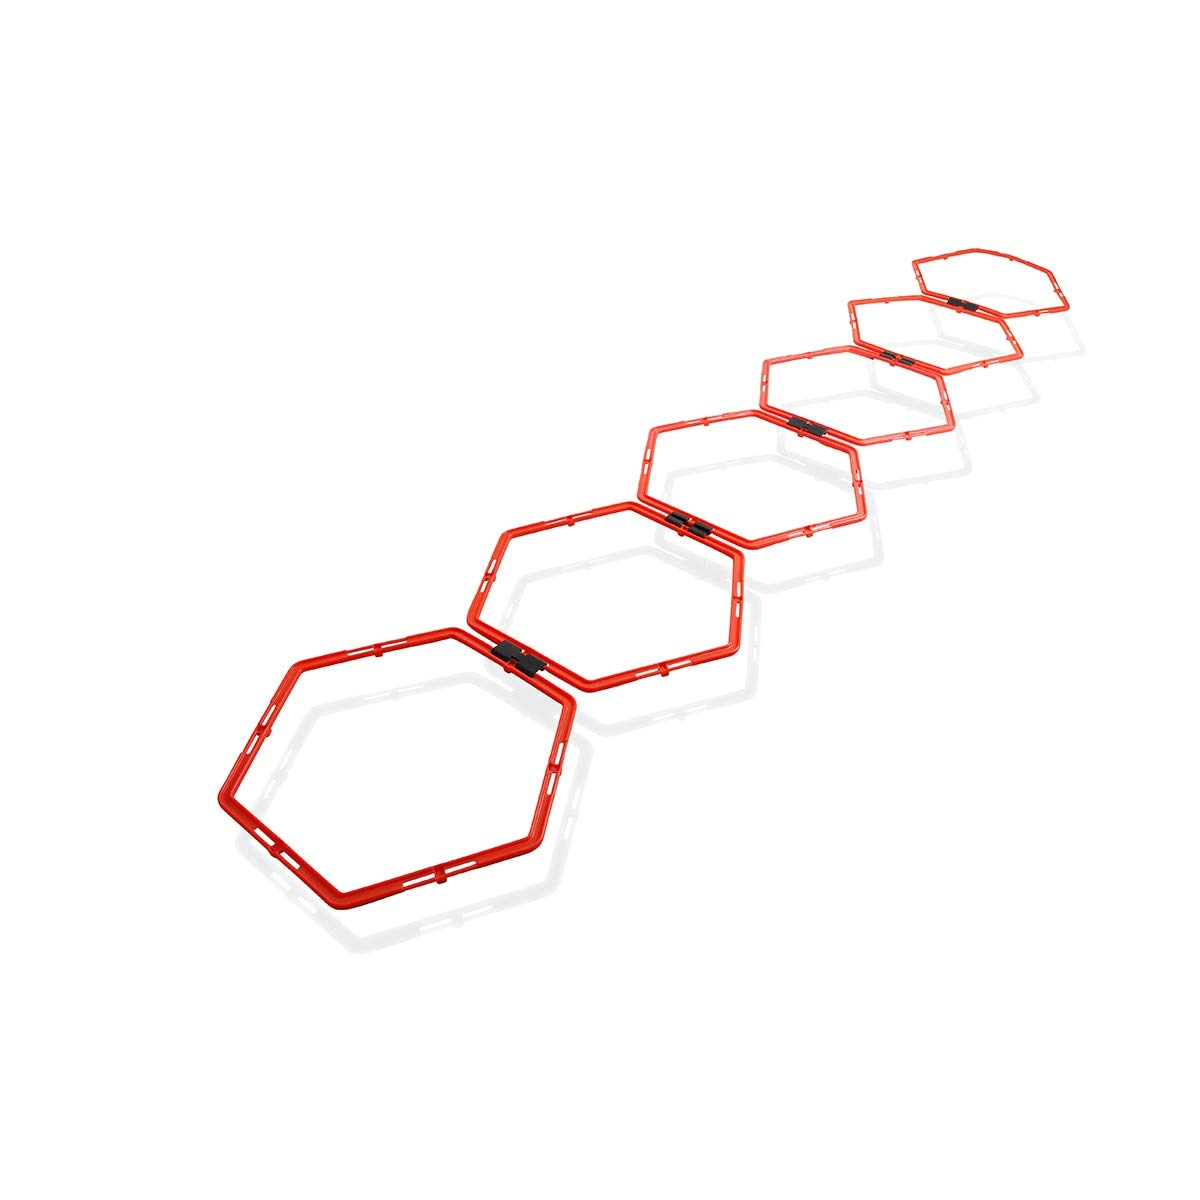 Avid Carp Extremity Swivel Lead 4.0oz 113g Karpfenblei